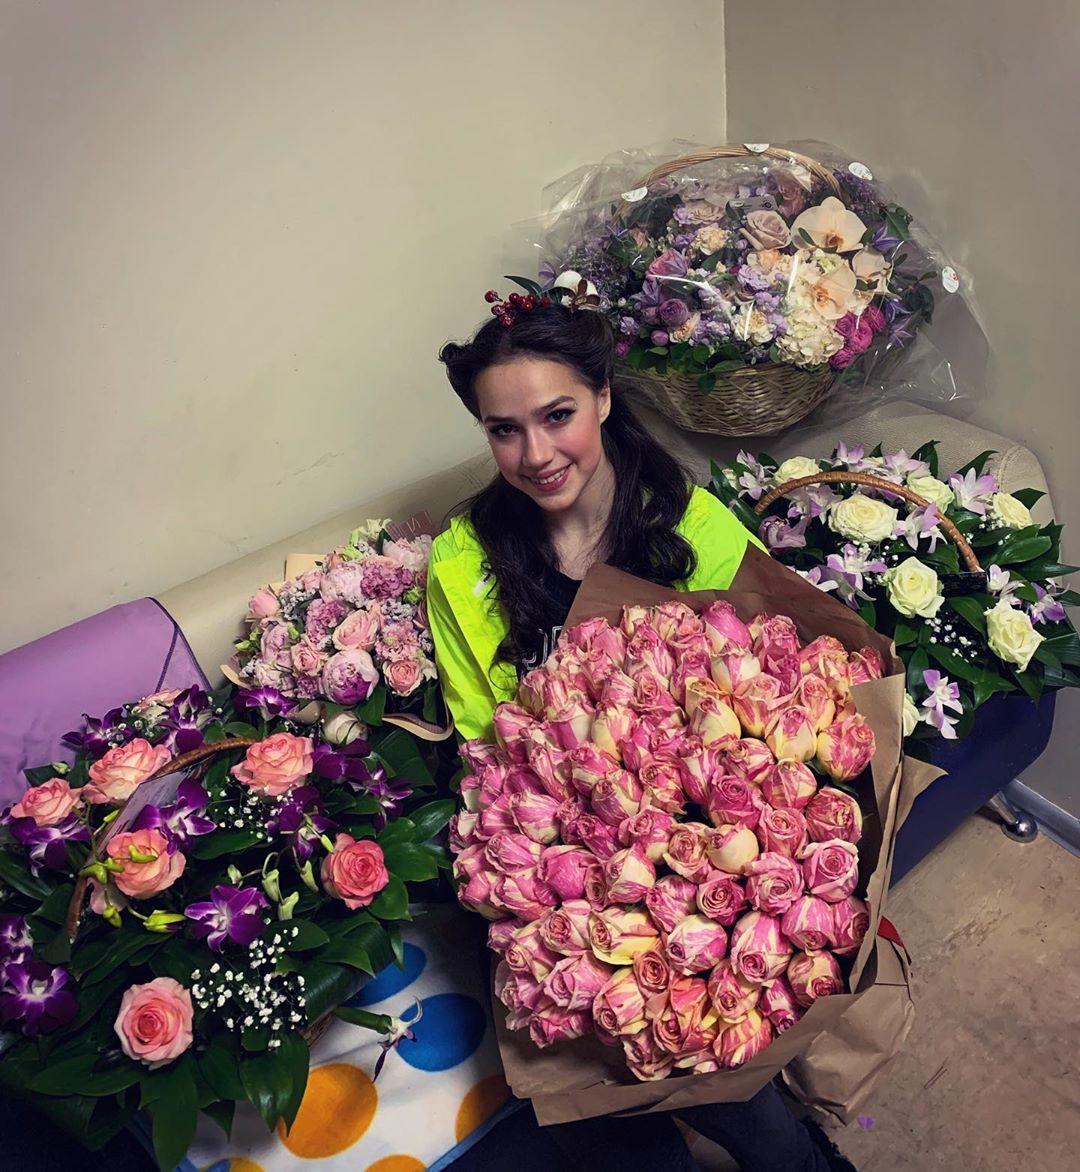 Алина Ильназовна Загитова-2   Олимпийская чемпионка - Страница 50 N21QzjowLgE